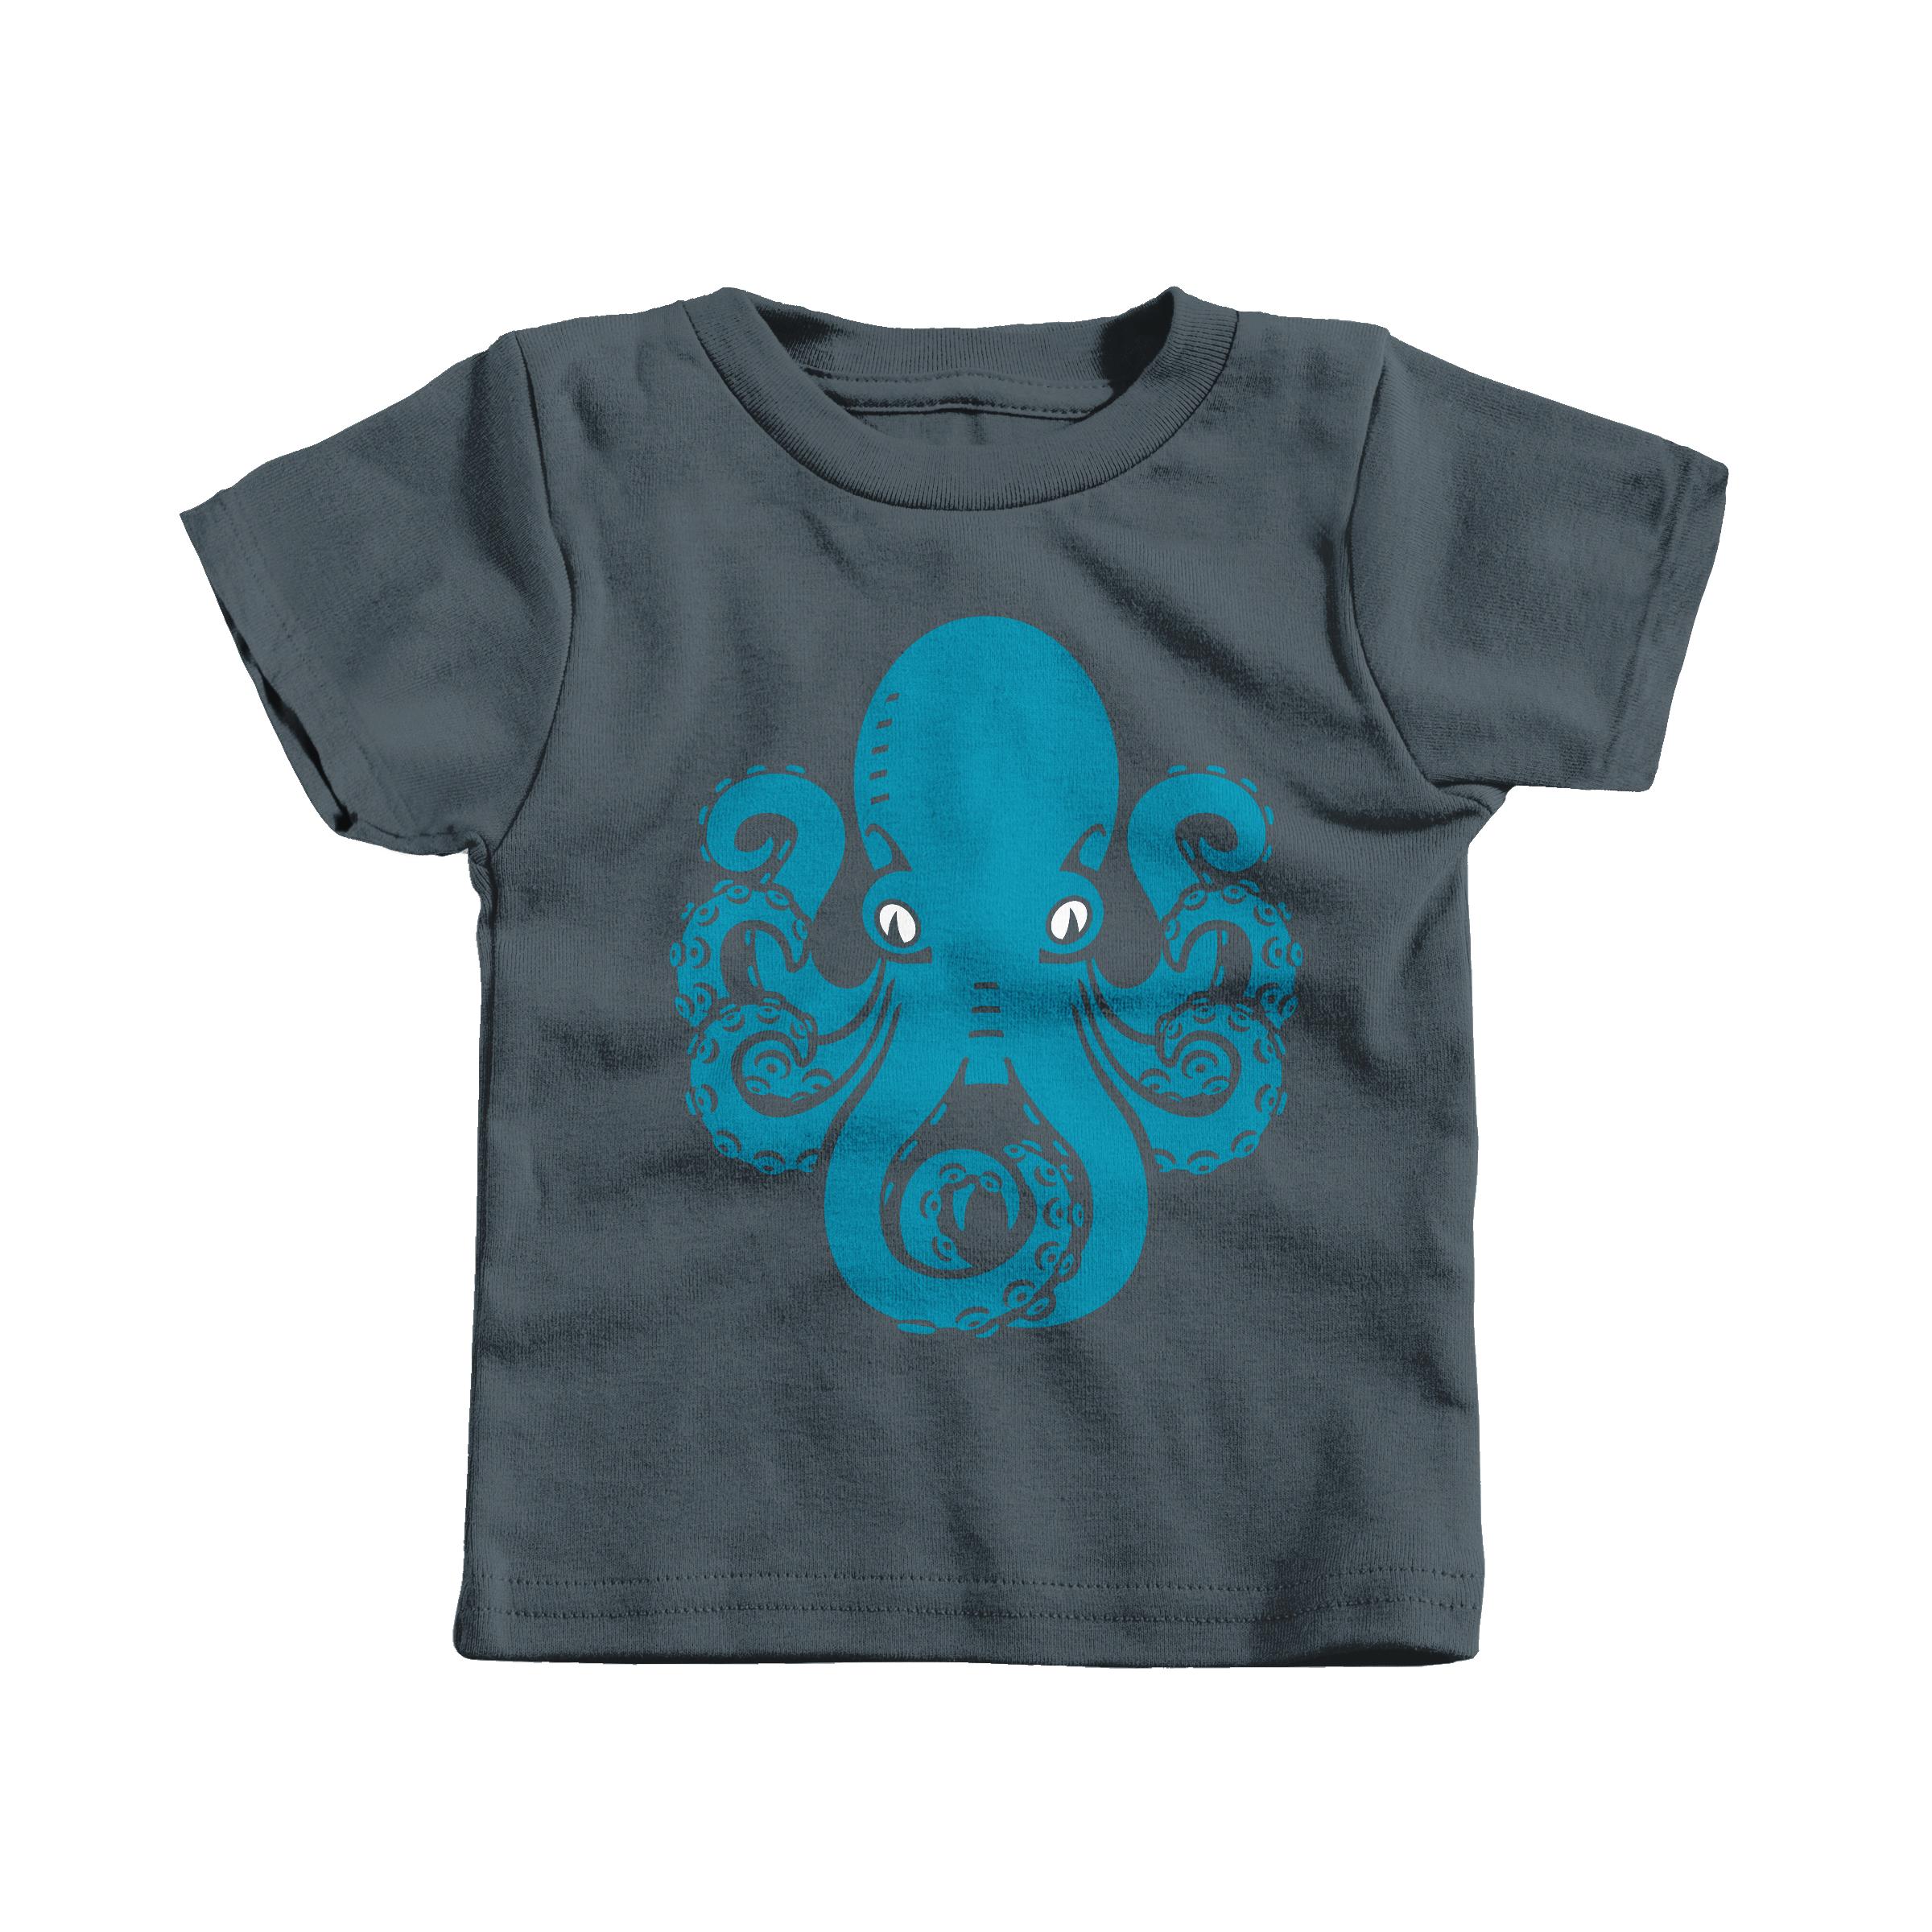 Eight Legged Friend Charcoal (T-Shirt)